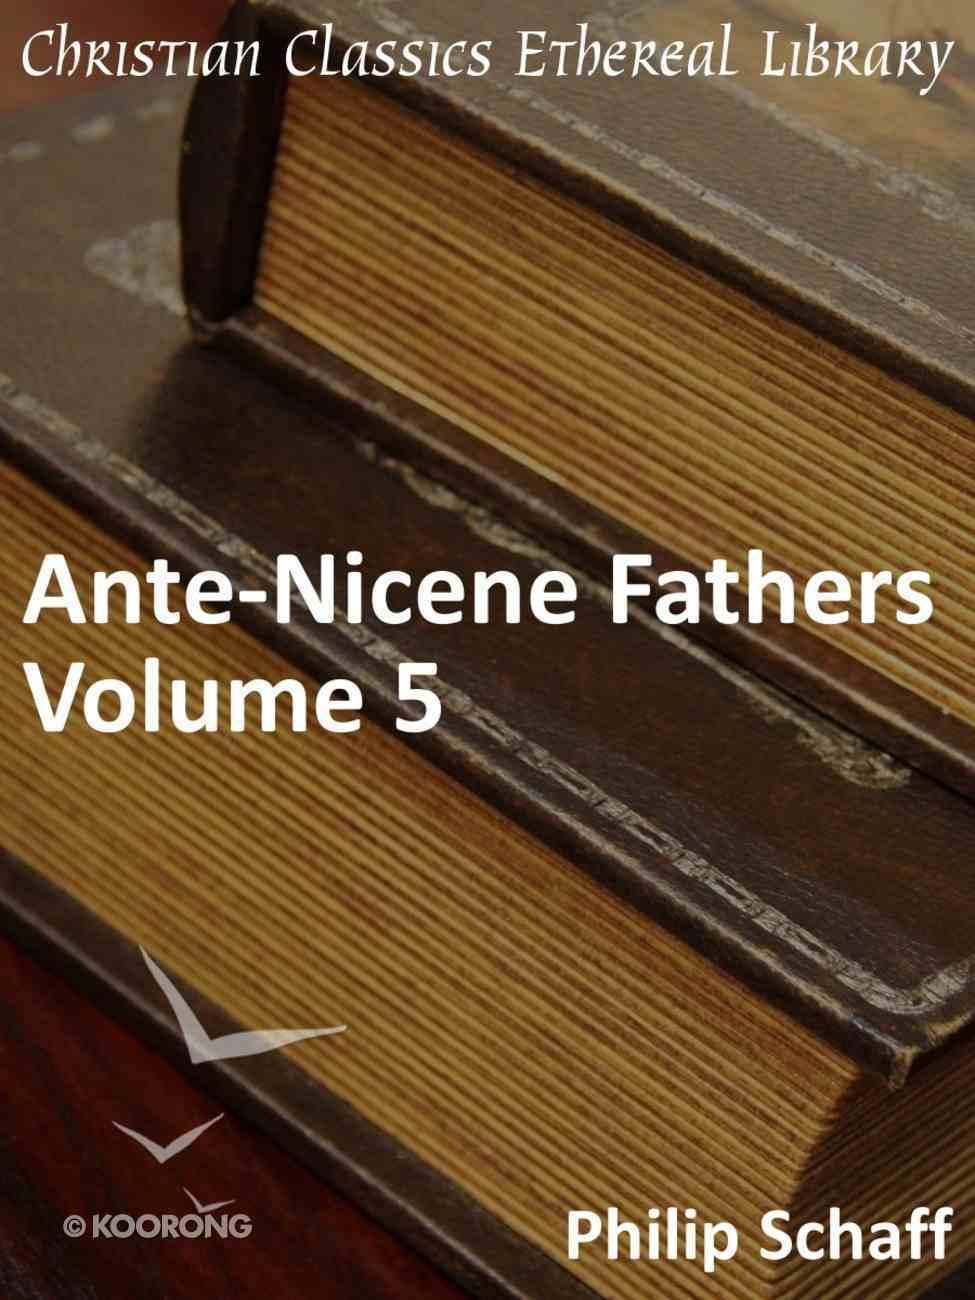 Ante-Nicene Fathers, Volume 5 eBook